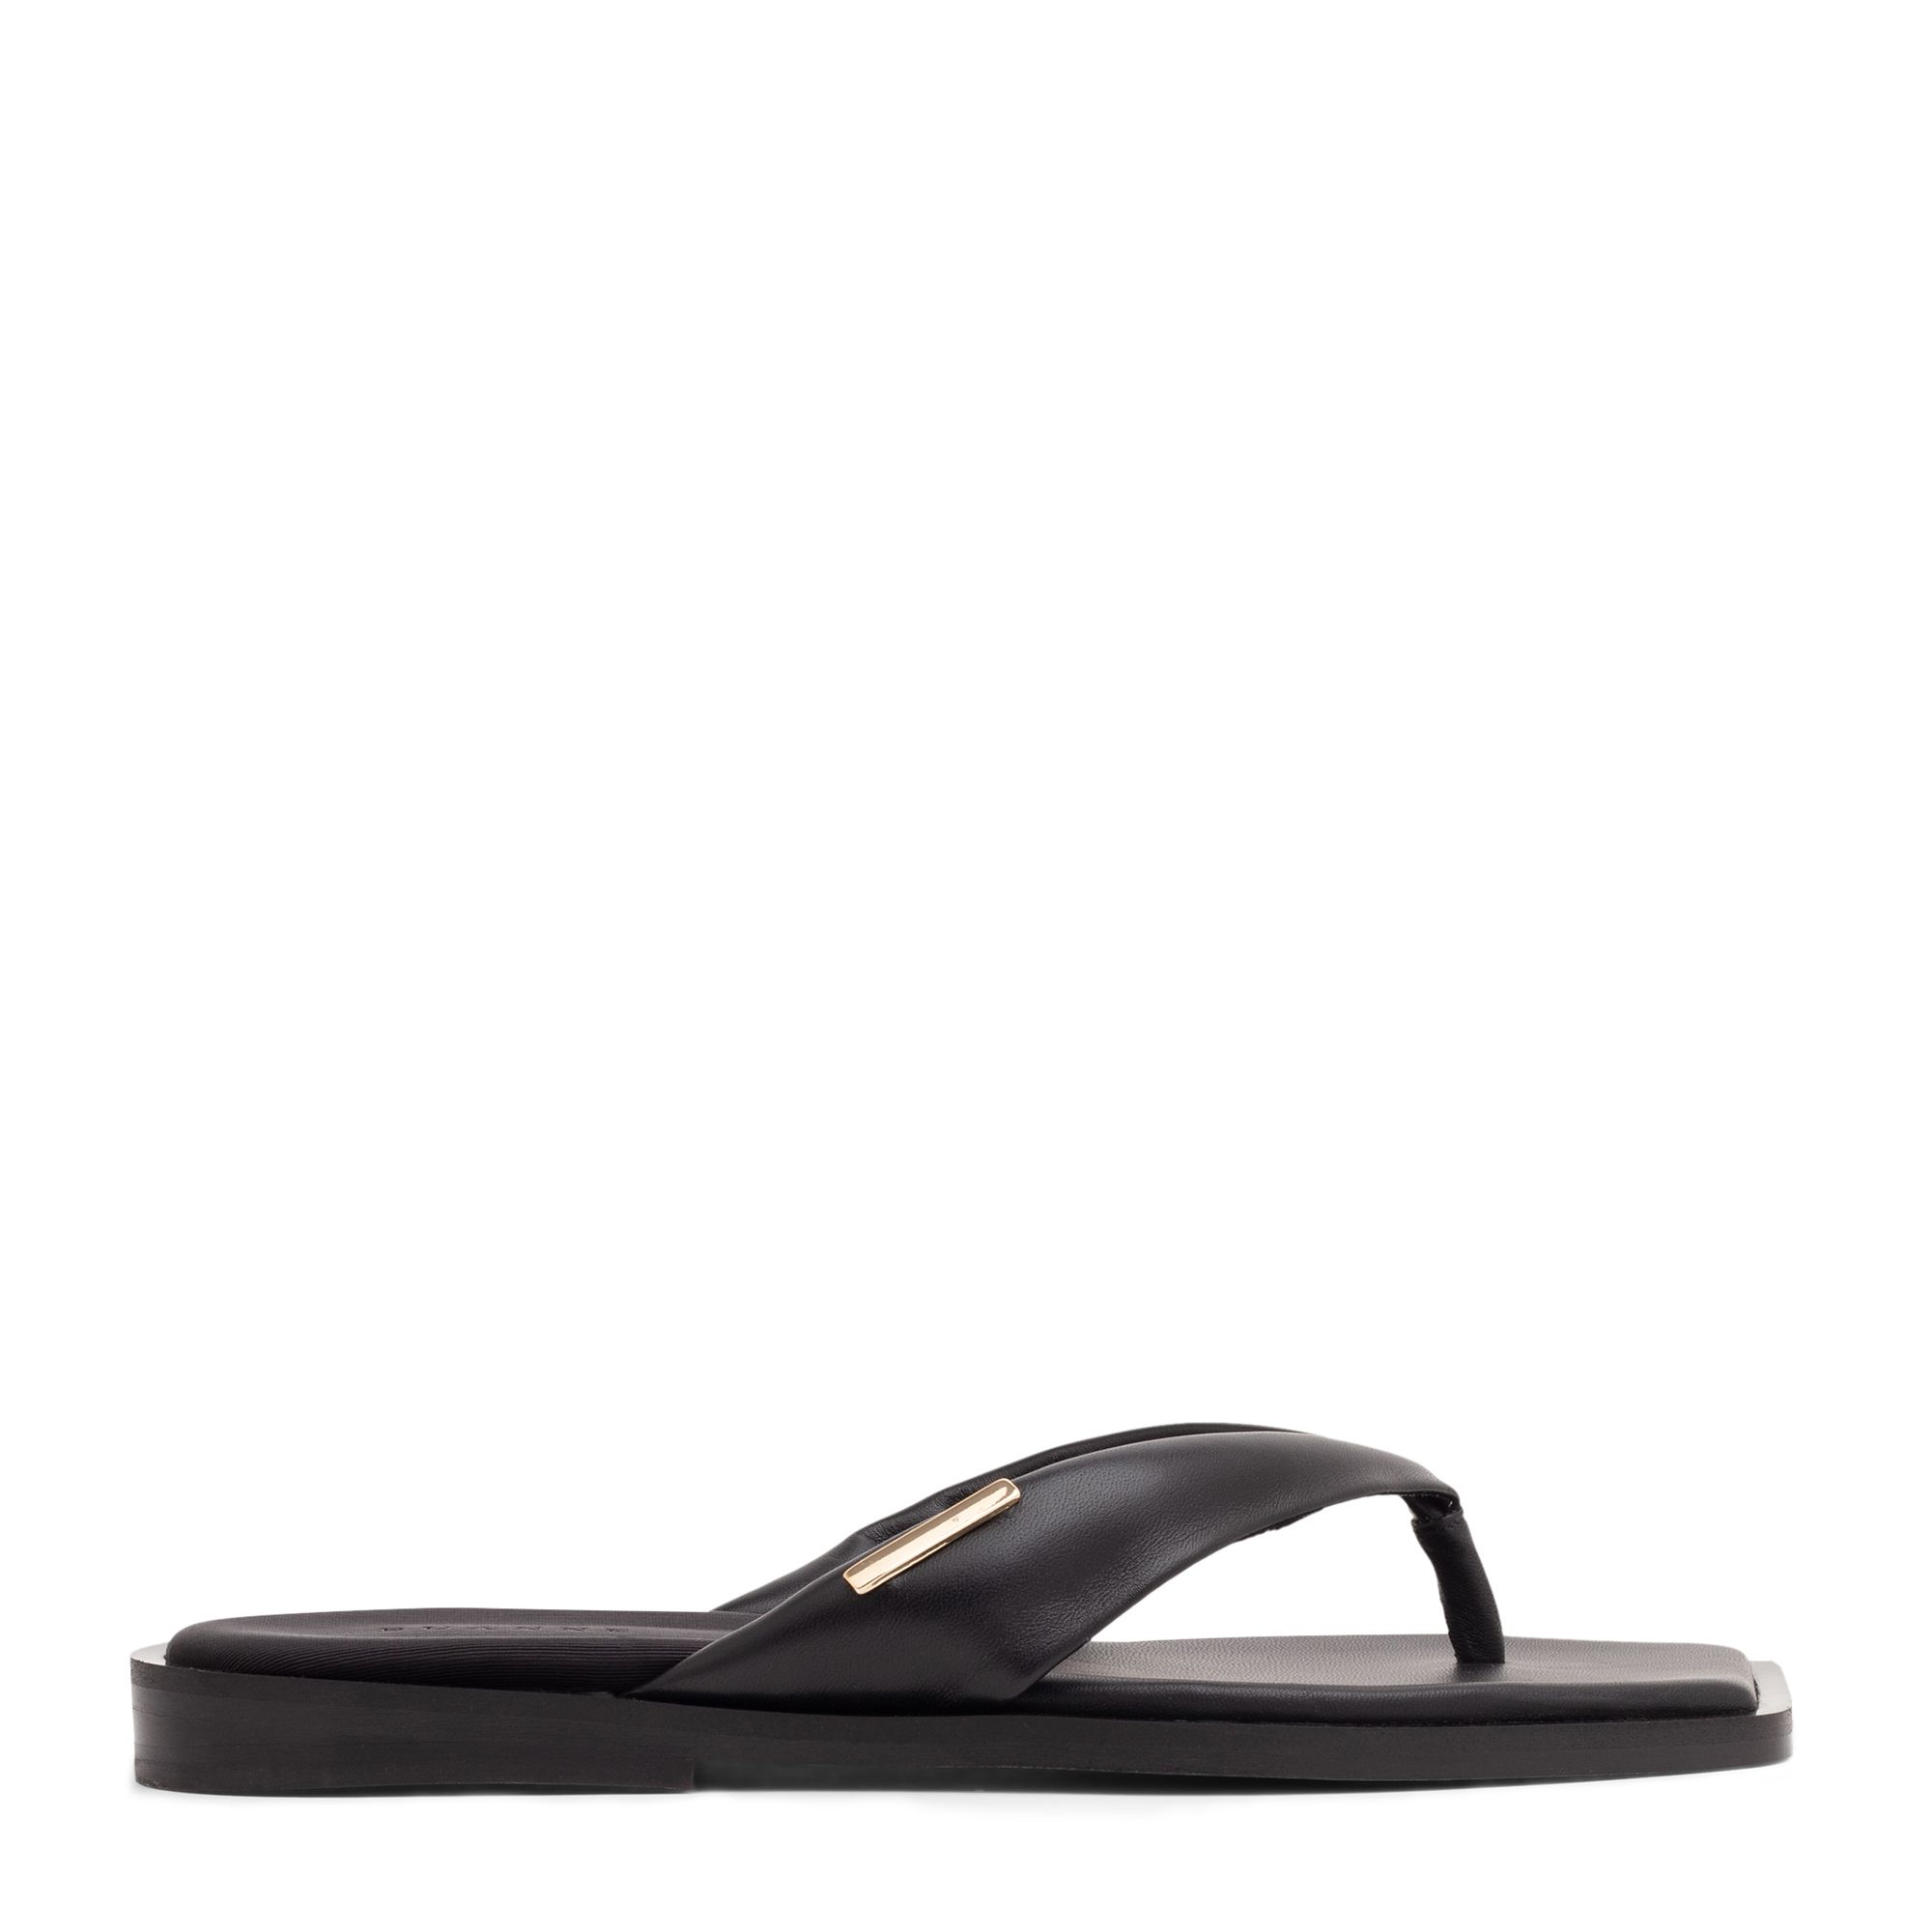 Brena sandals